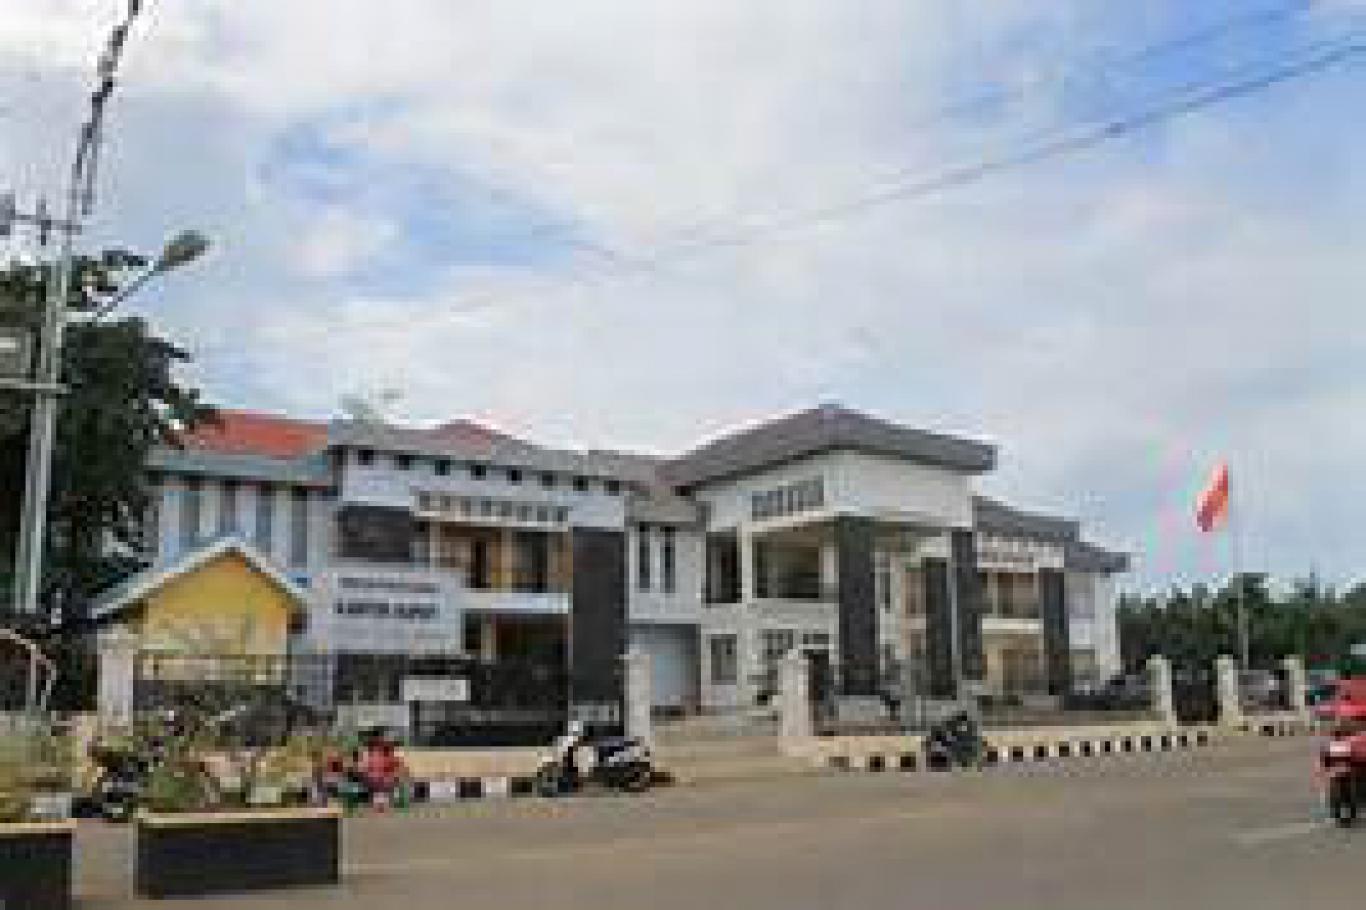 Daftar Nama Kecamatan Kelurahan Desa Kodepos Kota Kabupaten Lombok Utara